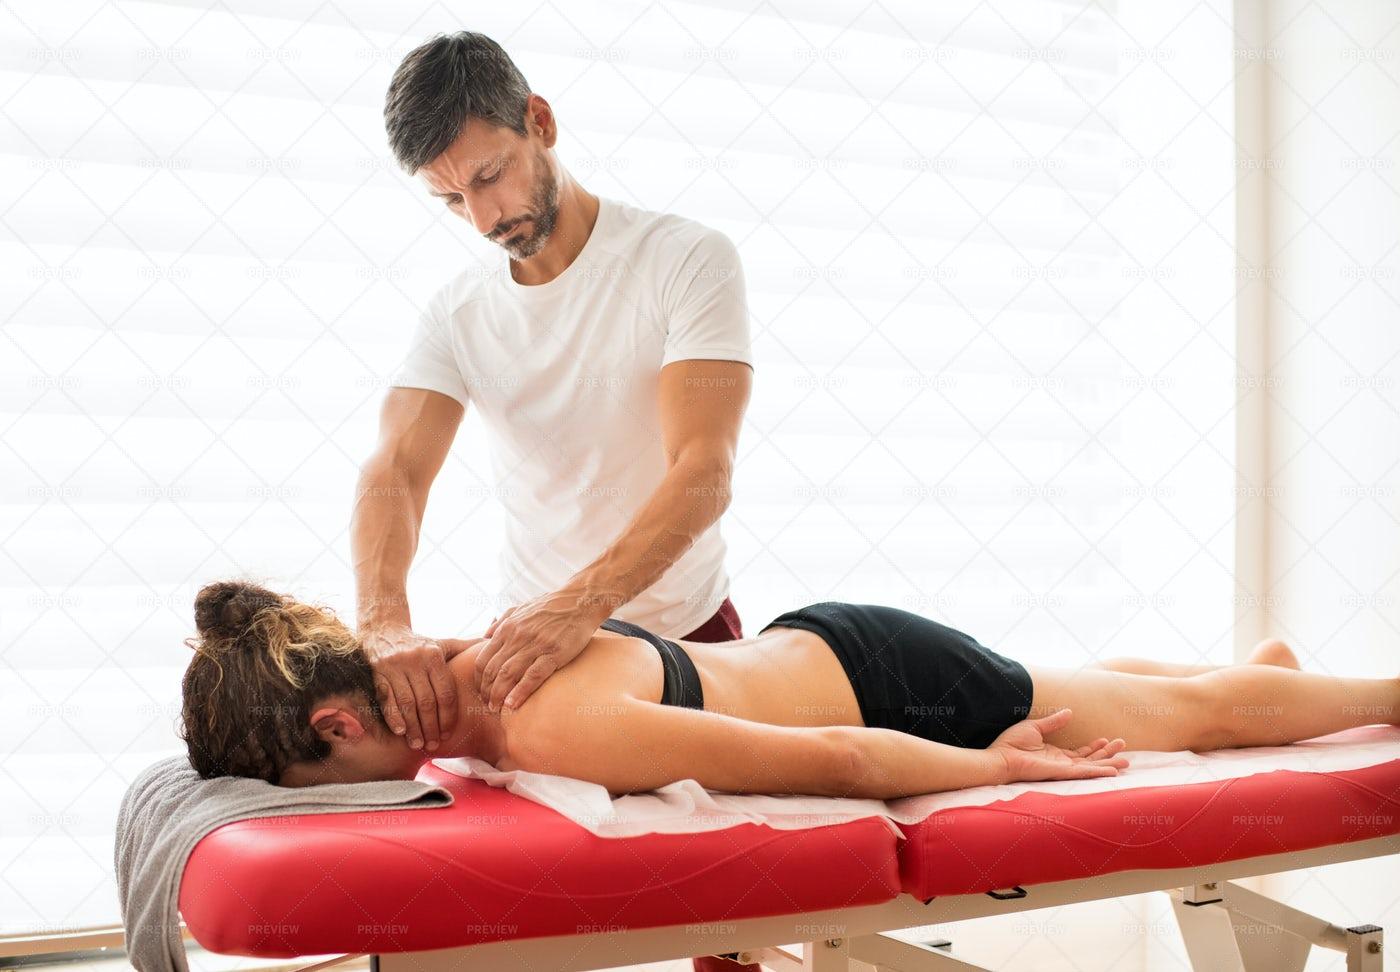 Osteopath Massaging A Female Patient: Stock Photos